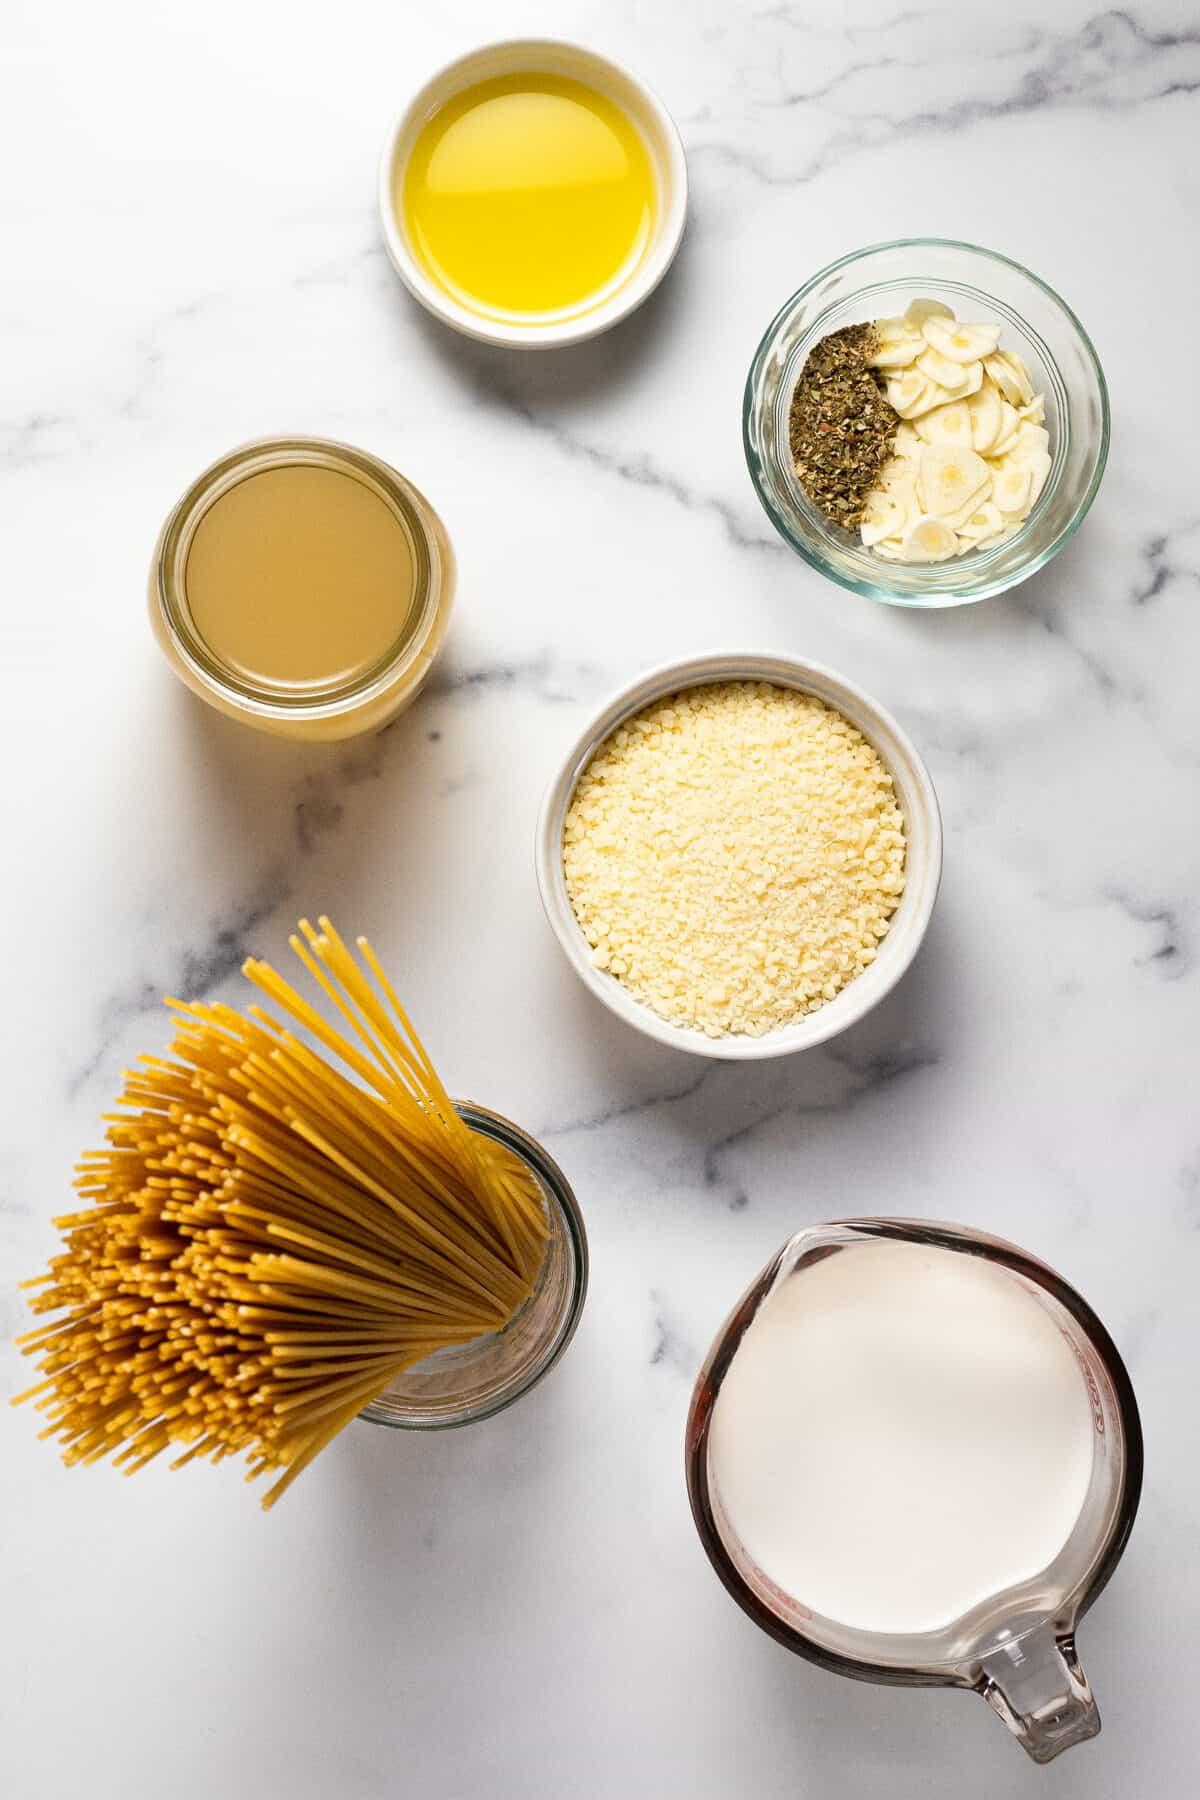 Marble counter top with ingredients to make garlic Parmesan pasta